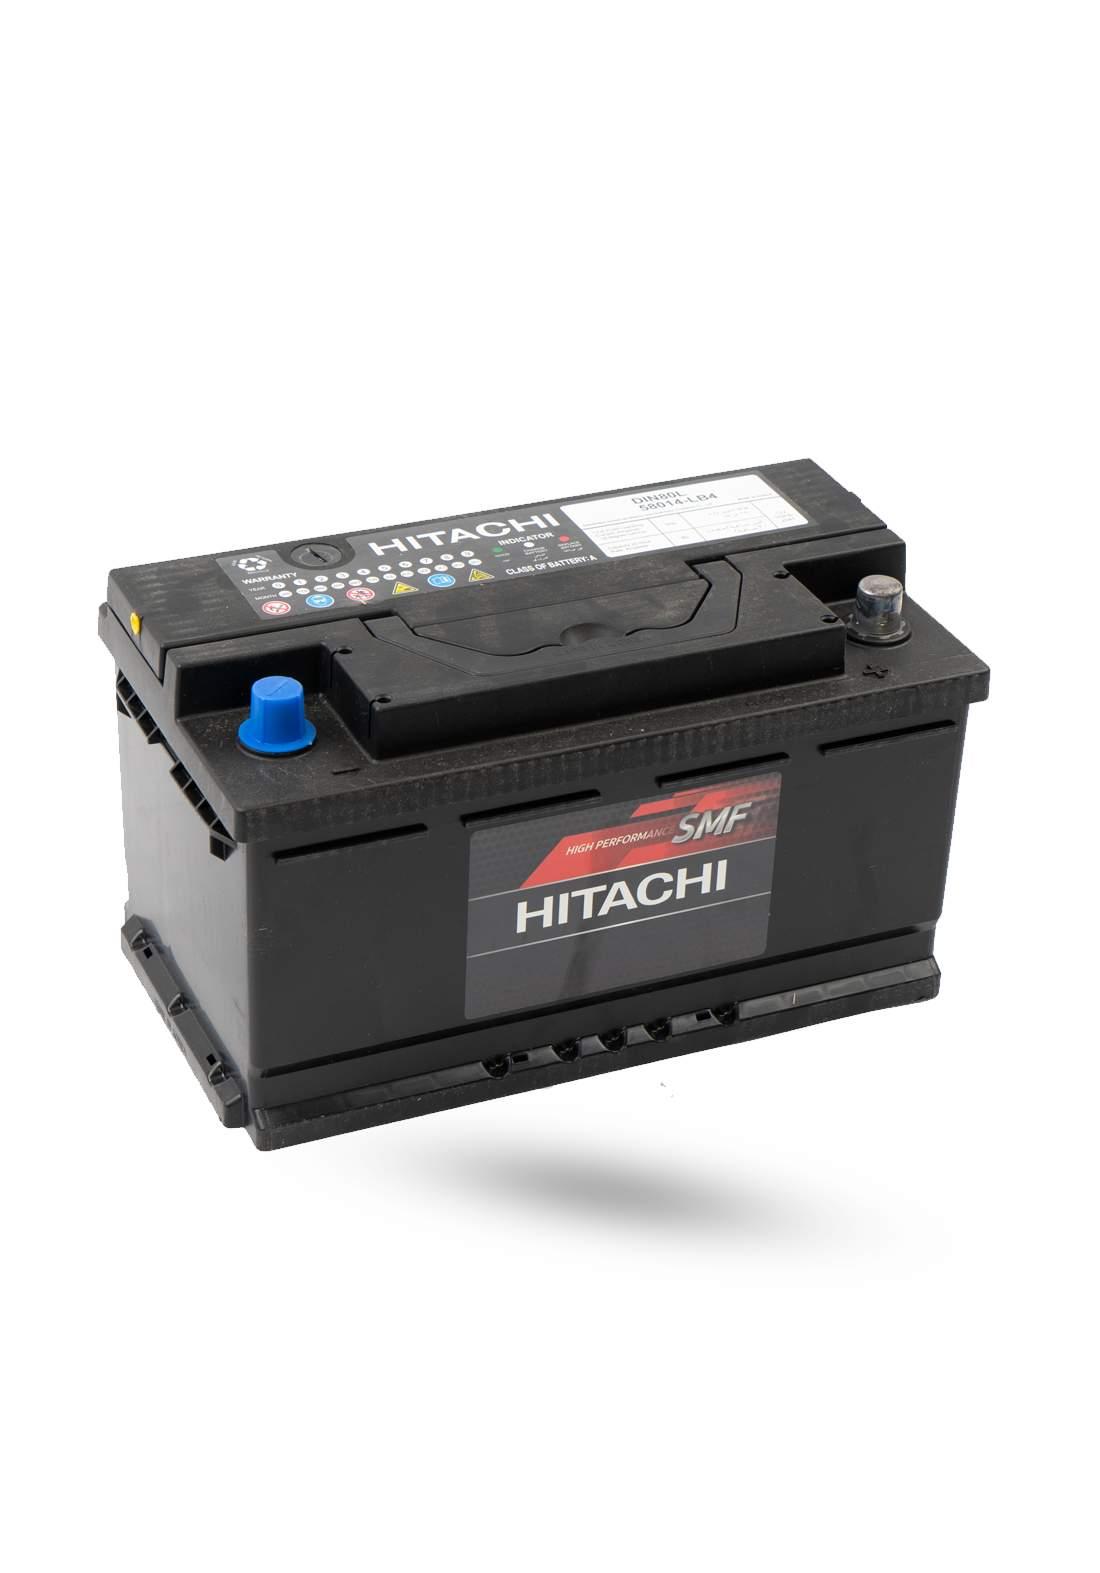 HITACHI 58014-LB4 Car Battery 12V 80A  بطارية سيارة 80 امبير